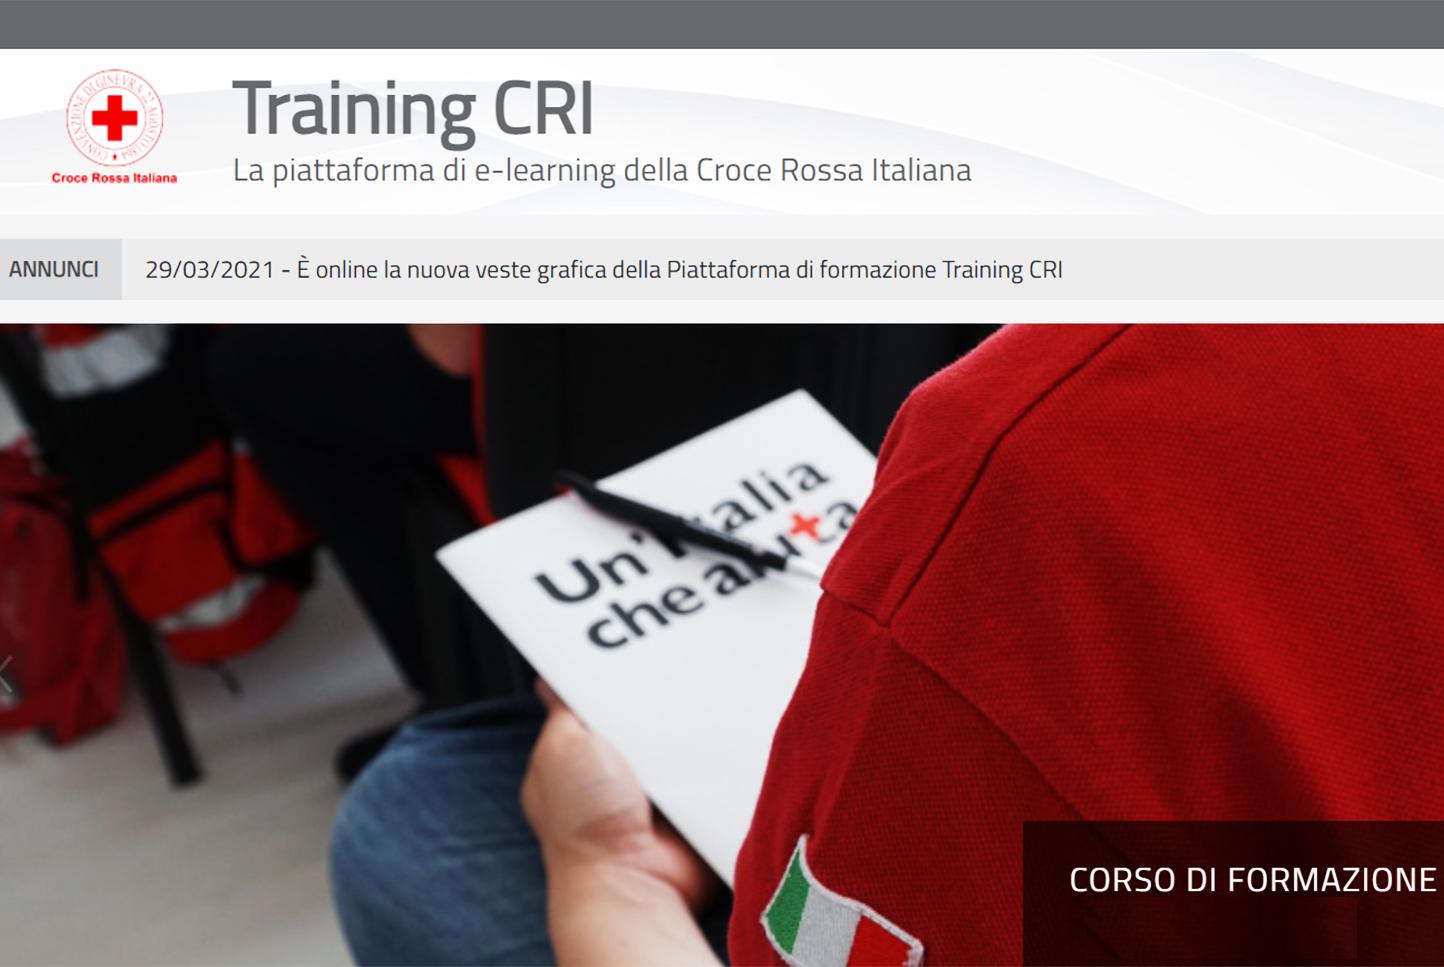 Training CRI